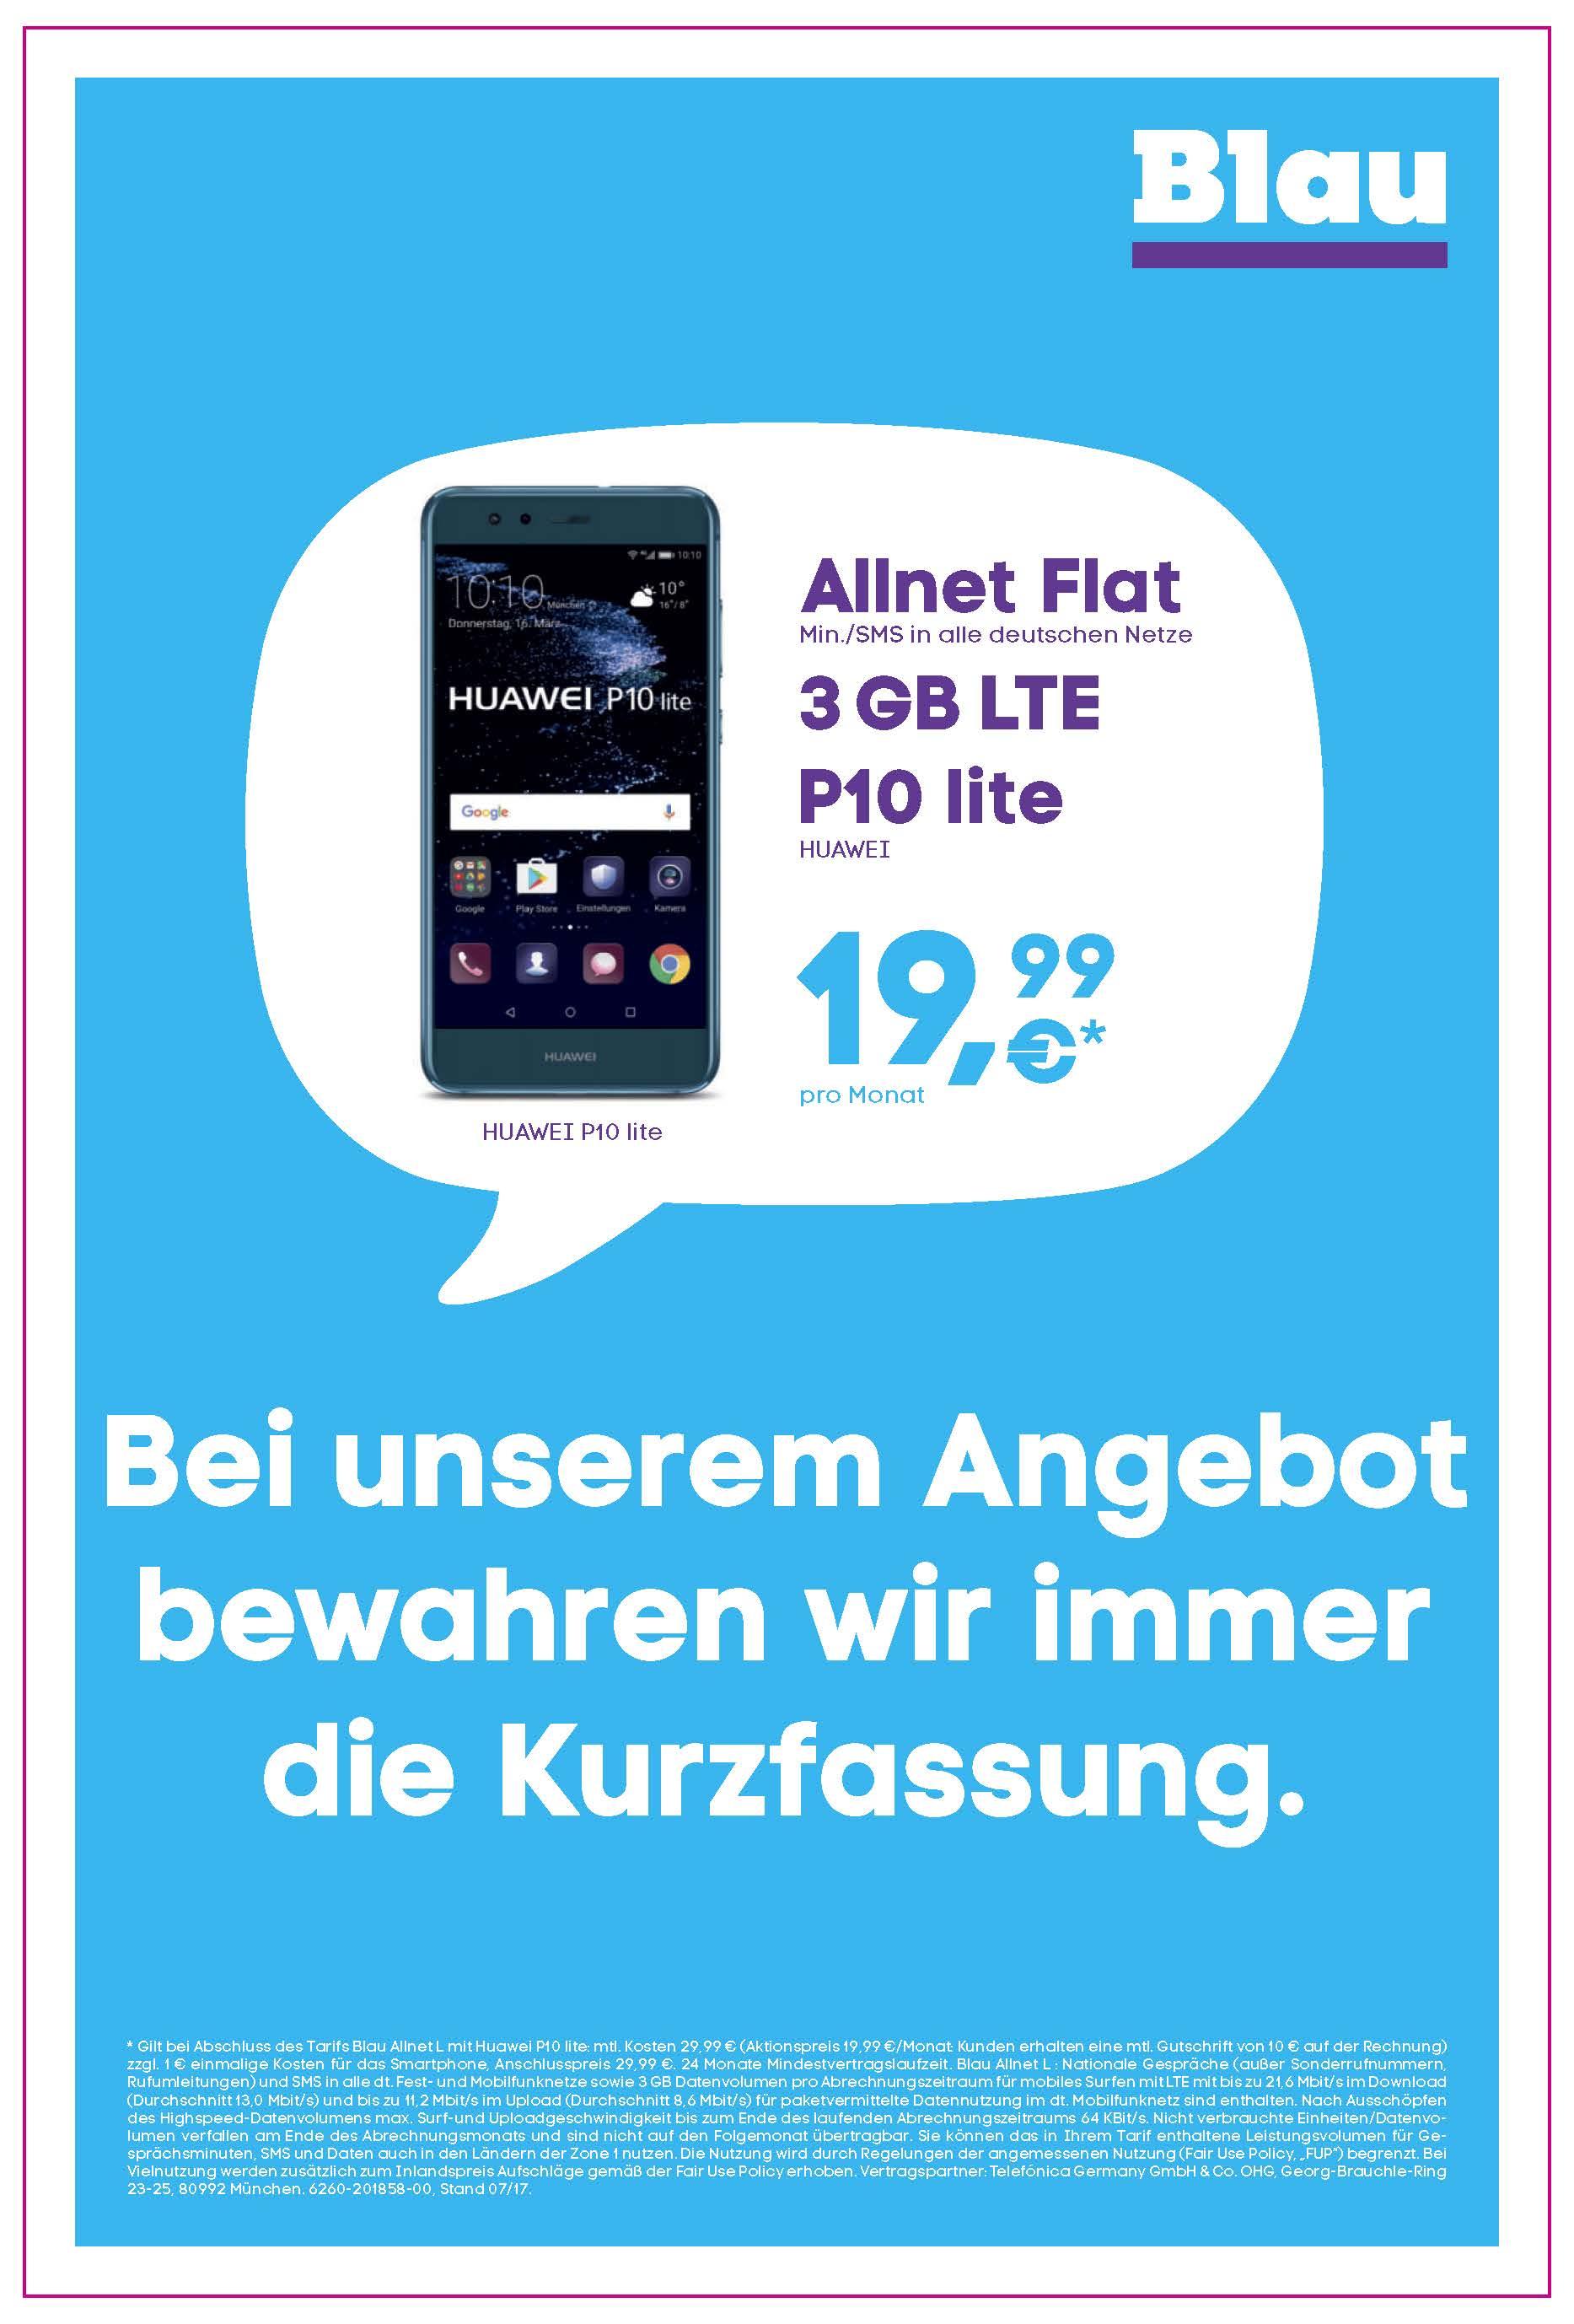 BLAU_OoH_Allnetflat_Huawei_P10_lite_CLP_M1730001_F39_150dpi_netto[1]_Seite_3.jpg